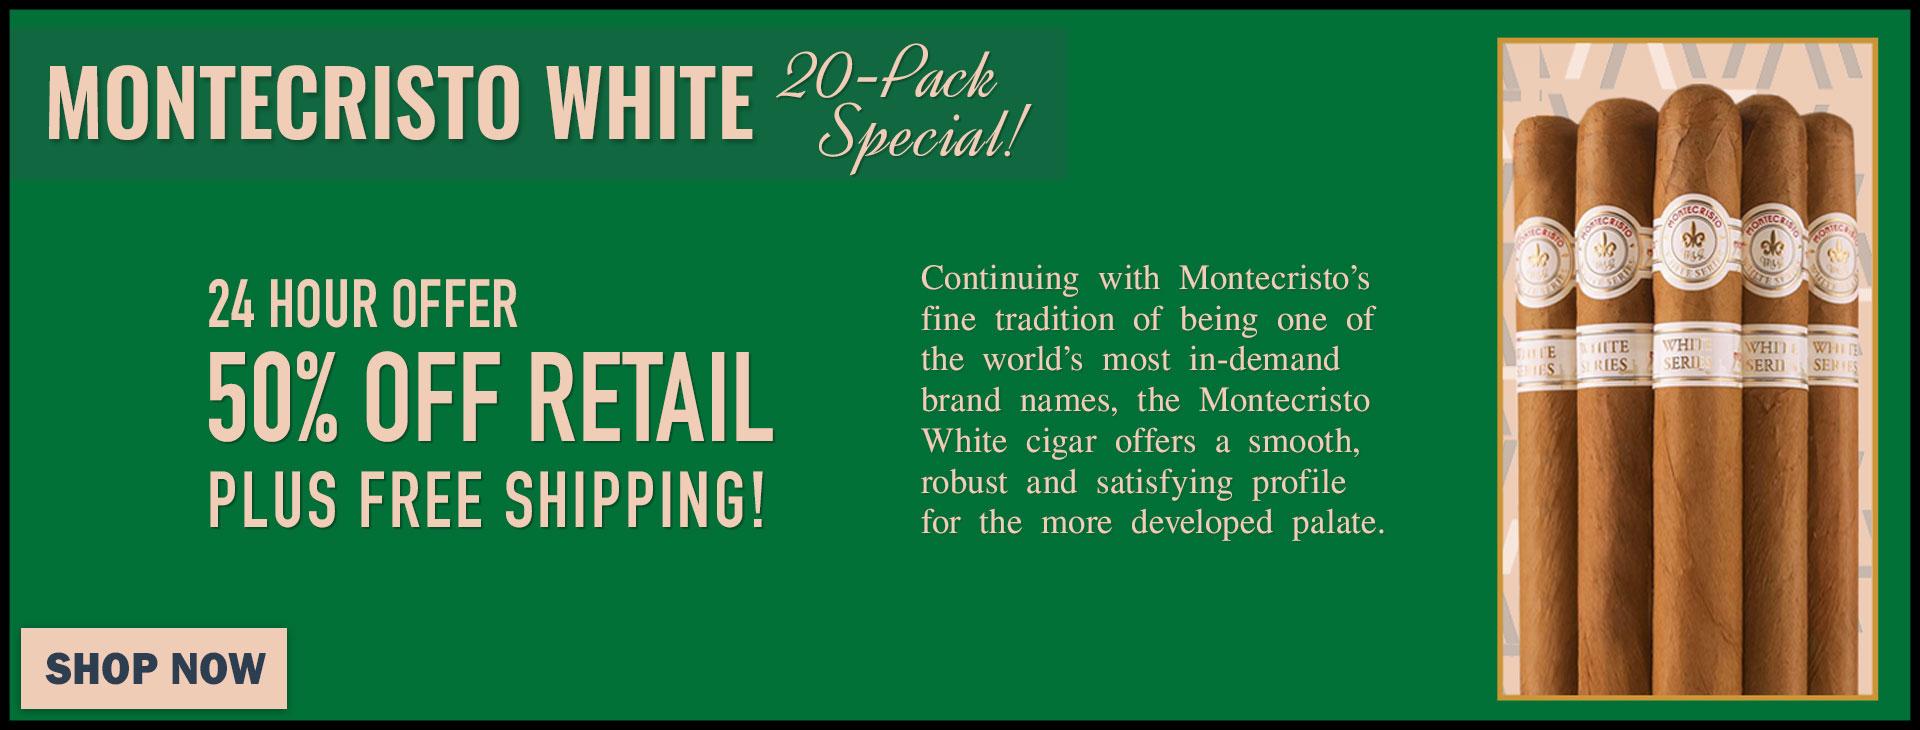 montecristo-white-2021-banner.jpg